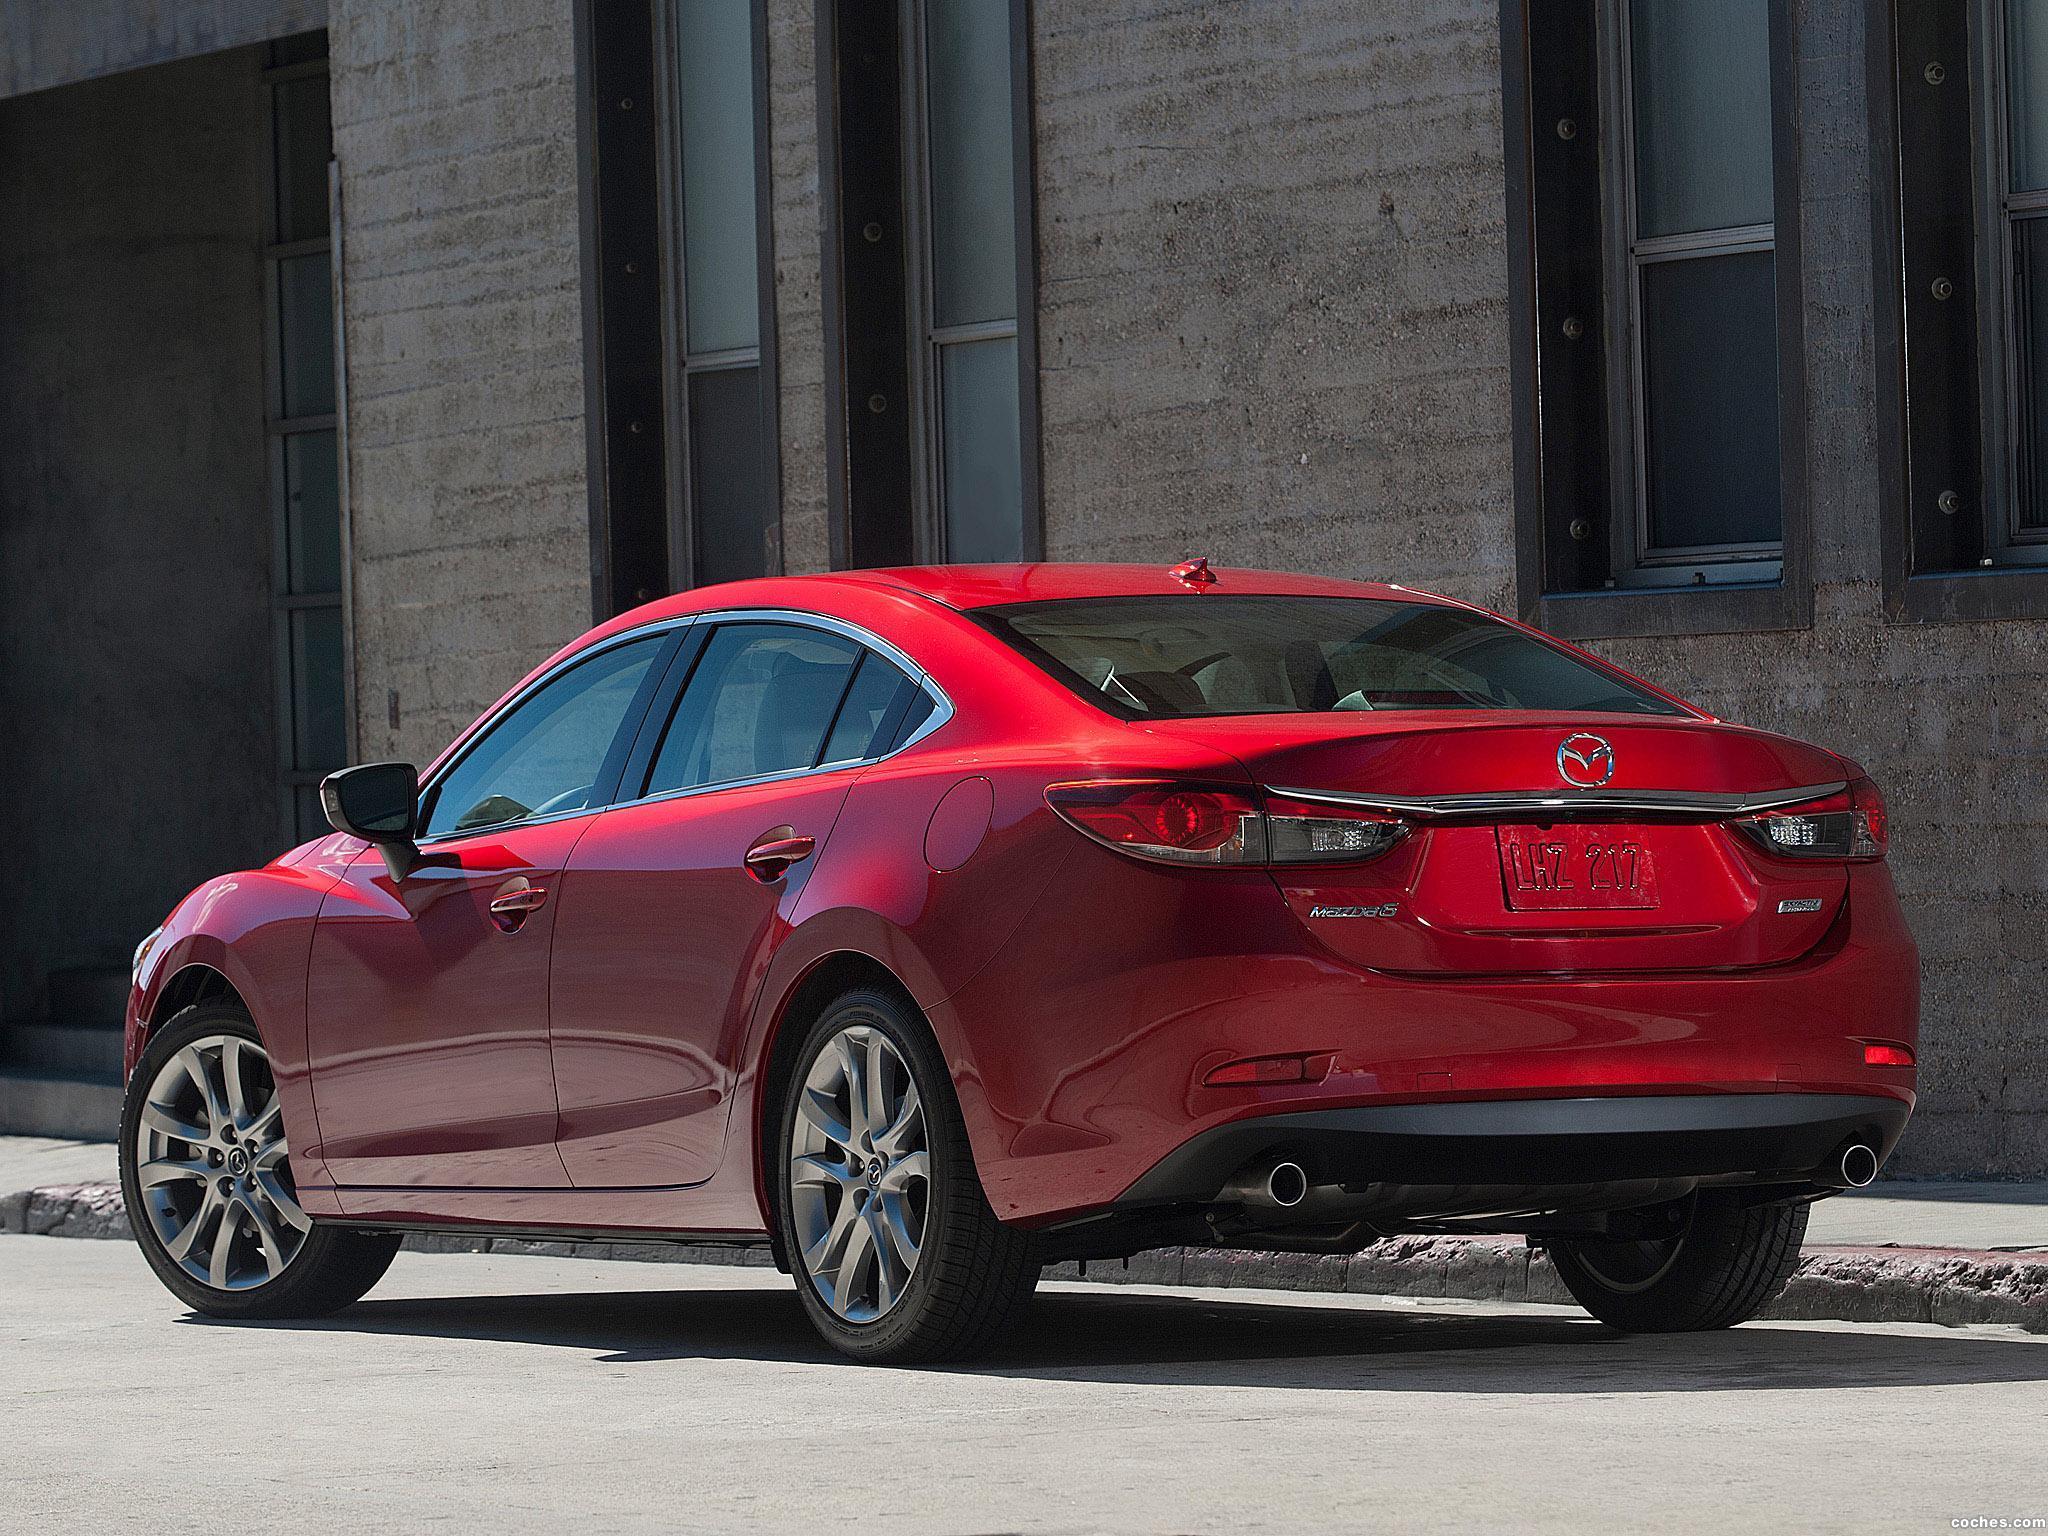 Foto 16 de Mazda 6 USA 2013